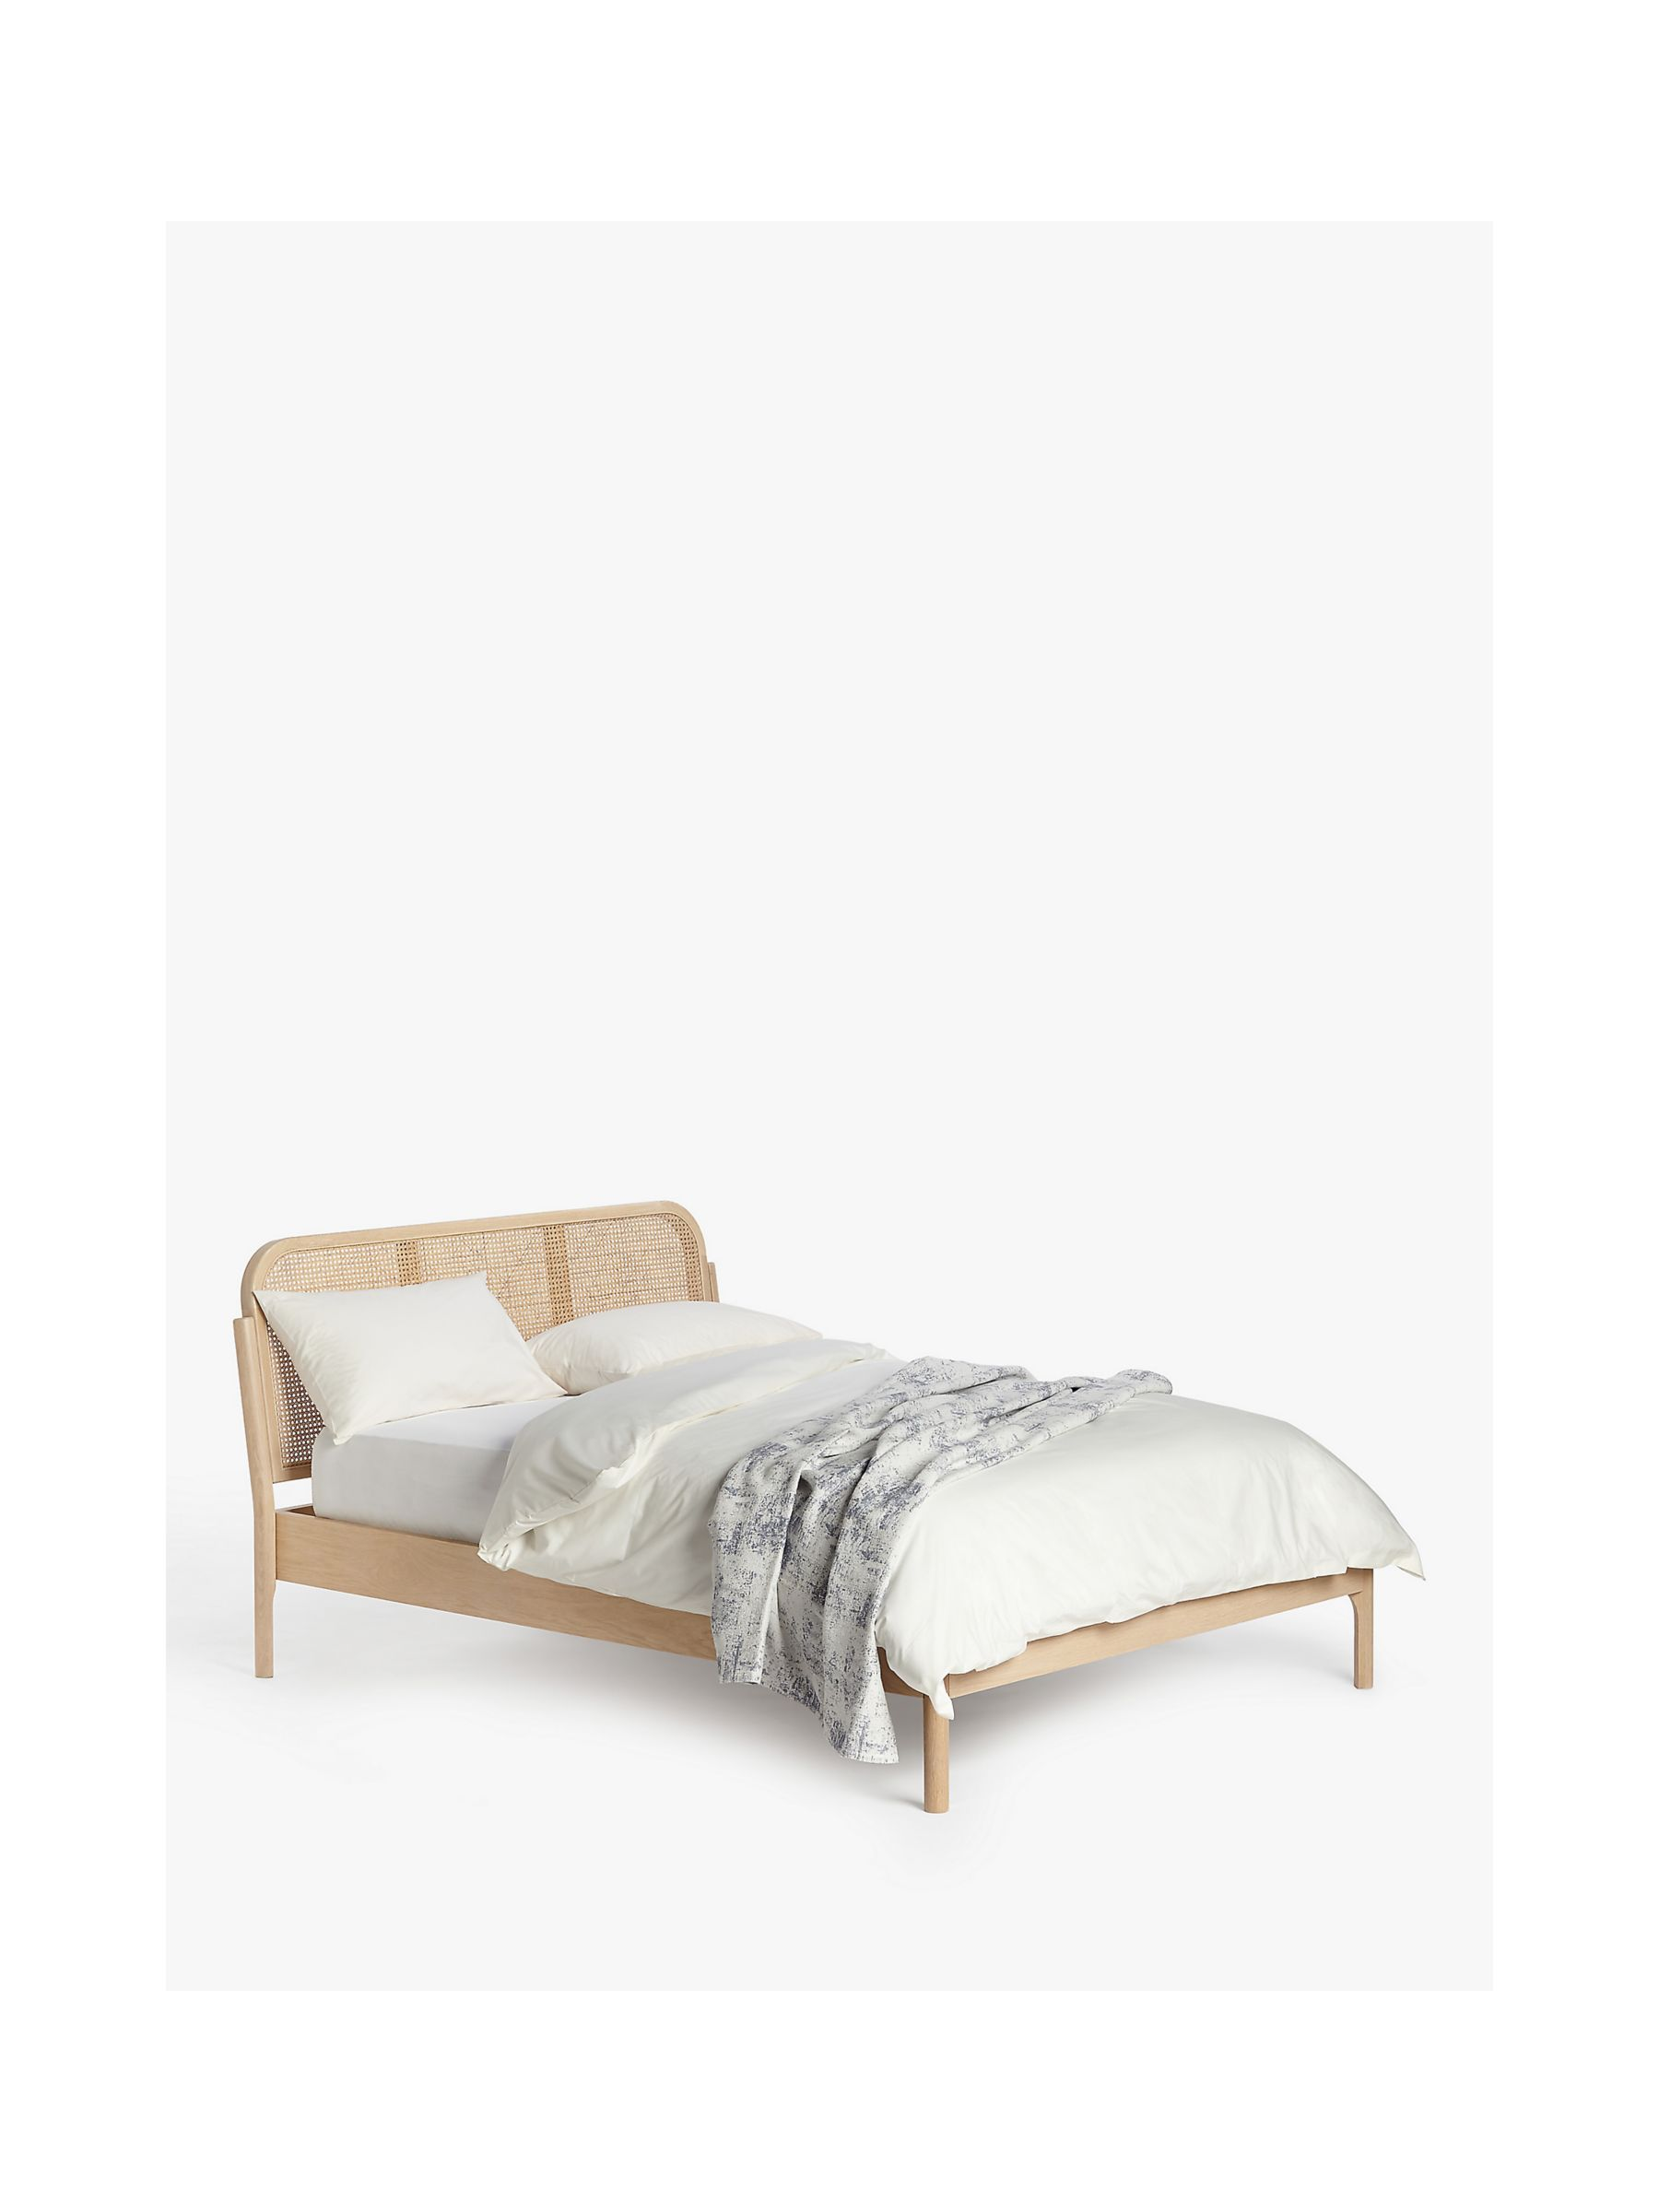 John Lewis Partners Rattan Bed Frame King Size At John Lewis Partners